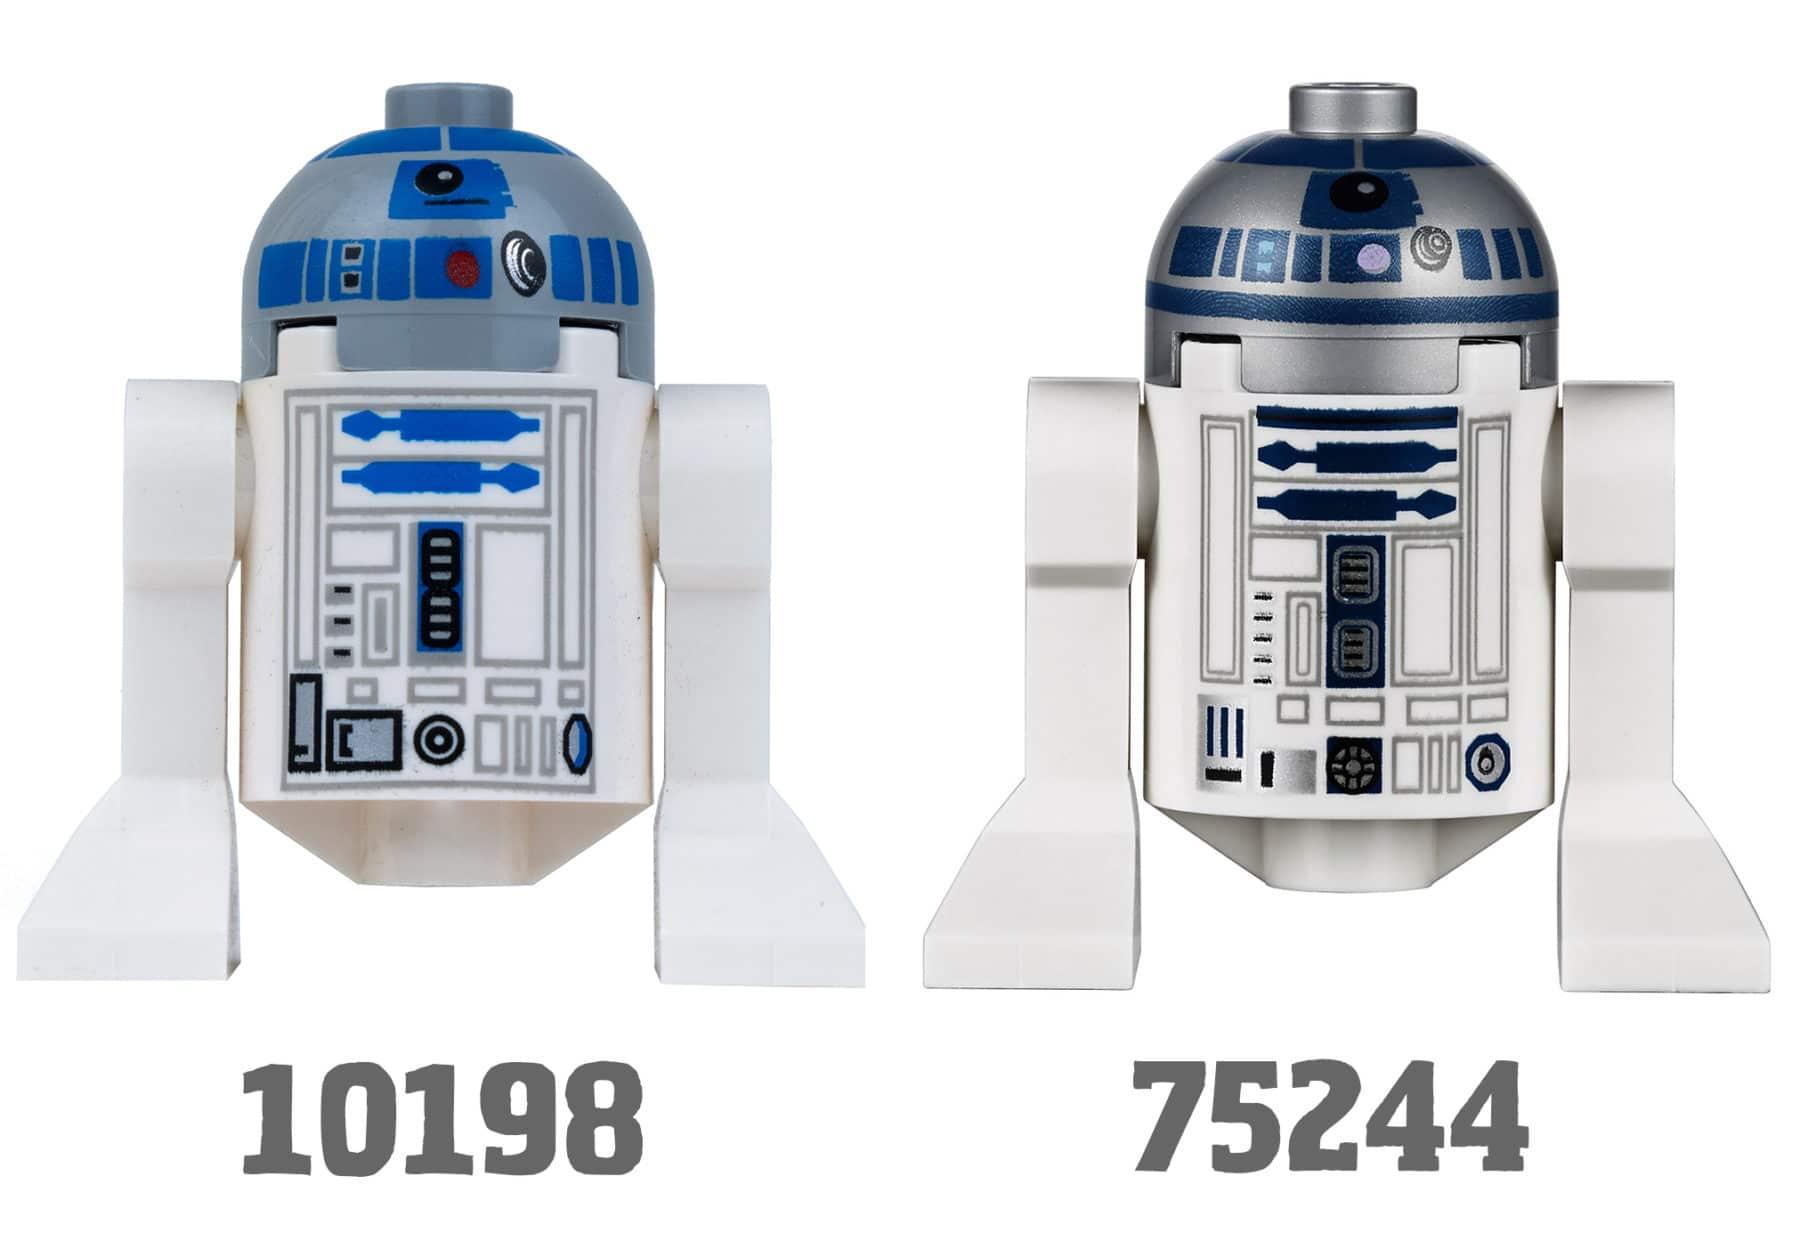 Tantive IV R2-D2 Vergleich